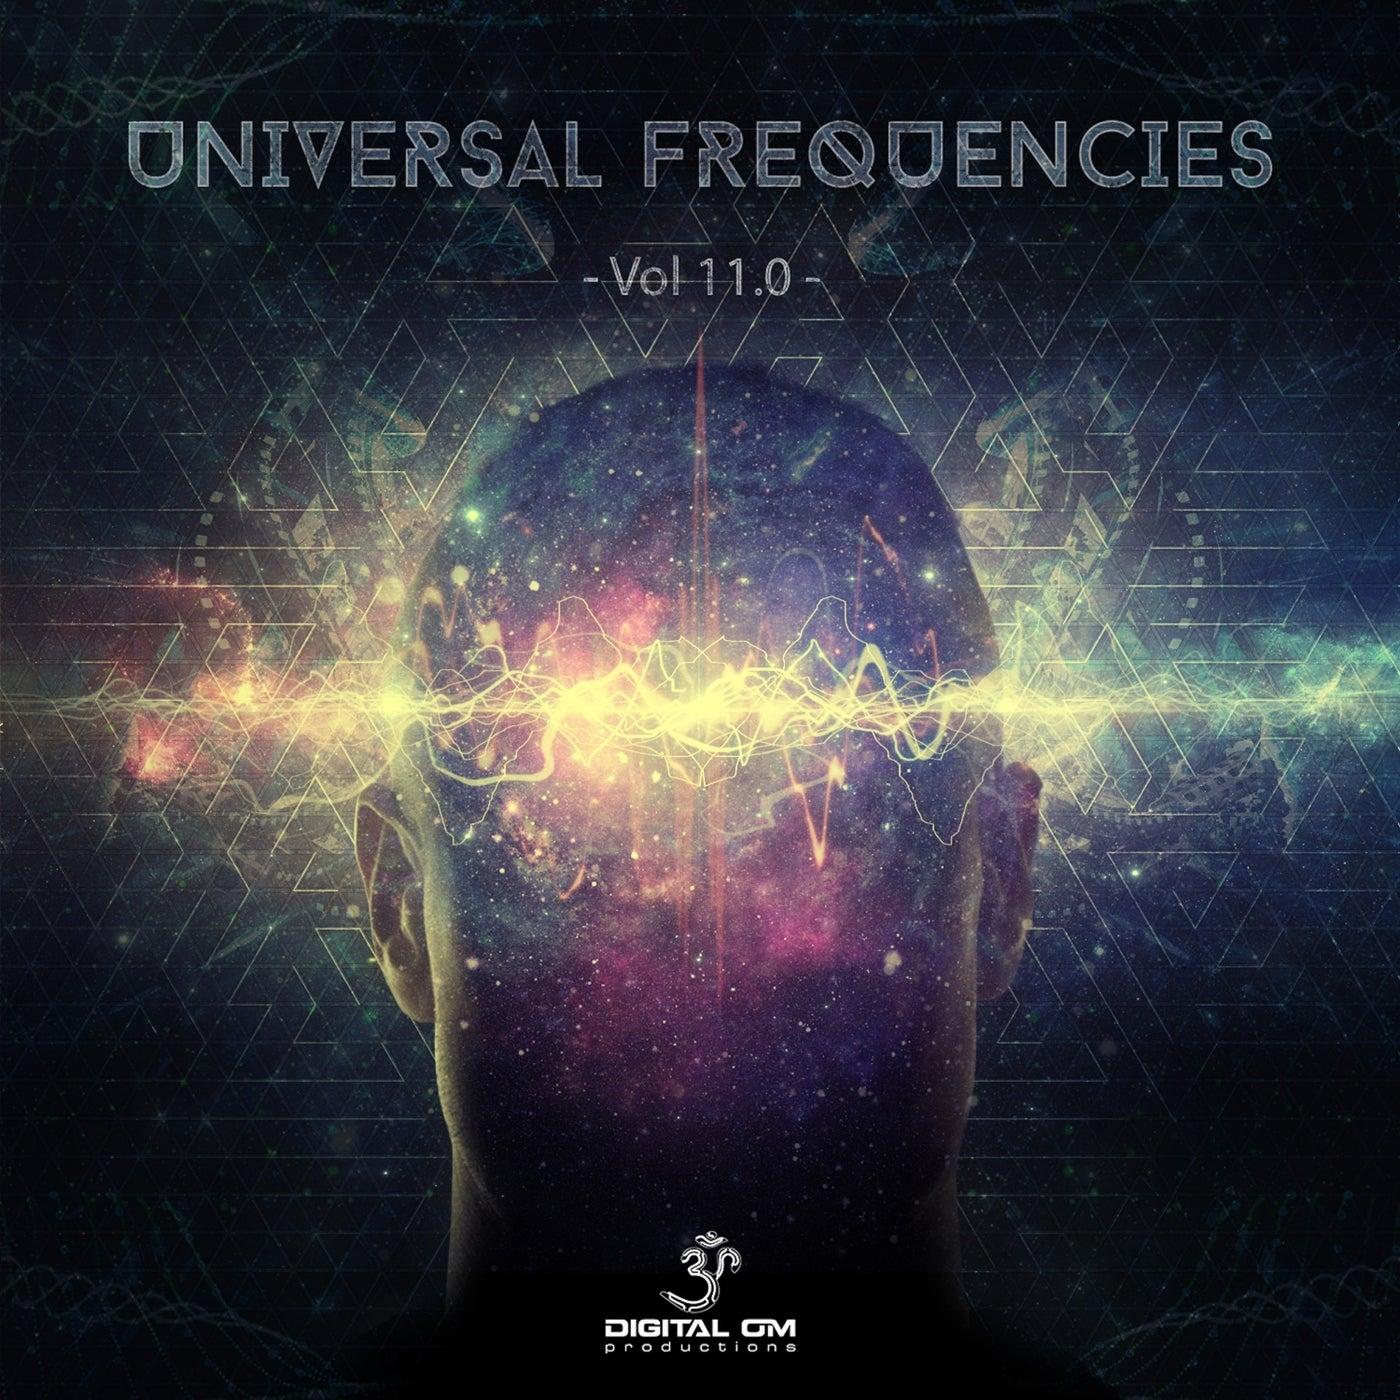 Universal Frequencies, Vol. 11